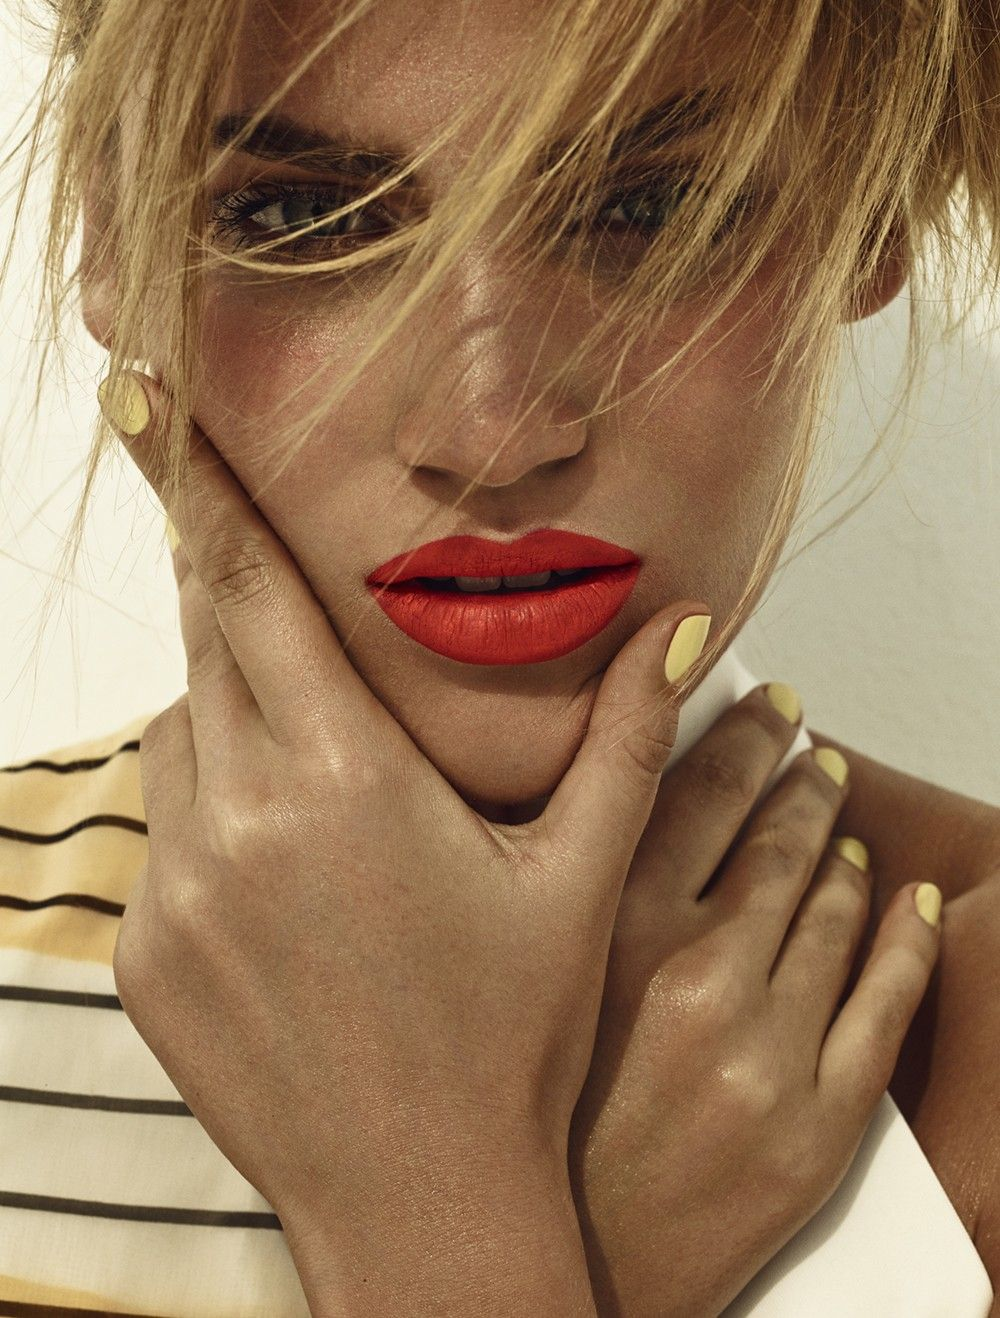 Sonya Gorelova By Hong Jang Hyun For Mixt E Magazine Summer 2015